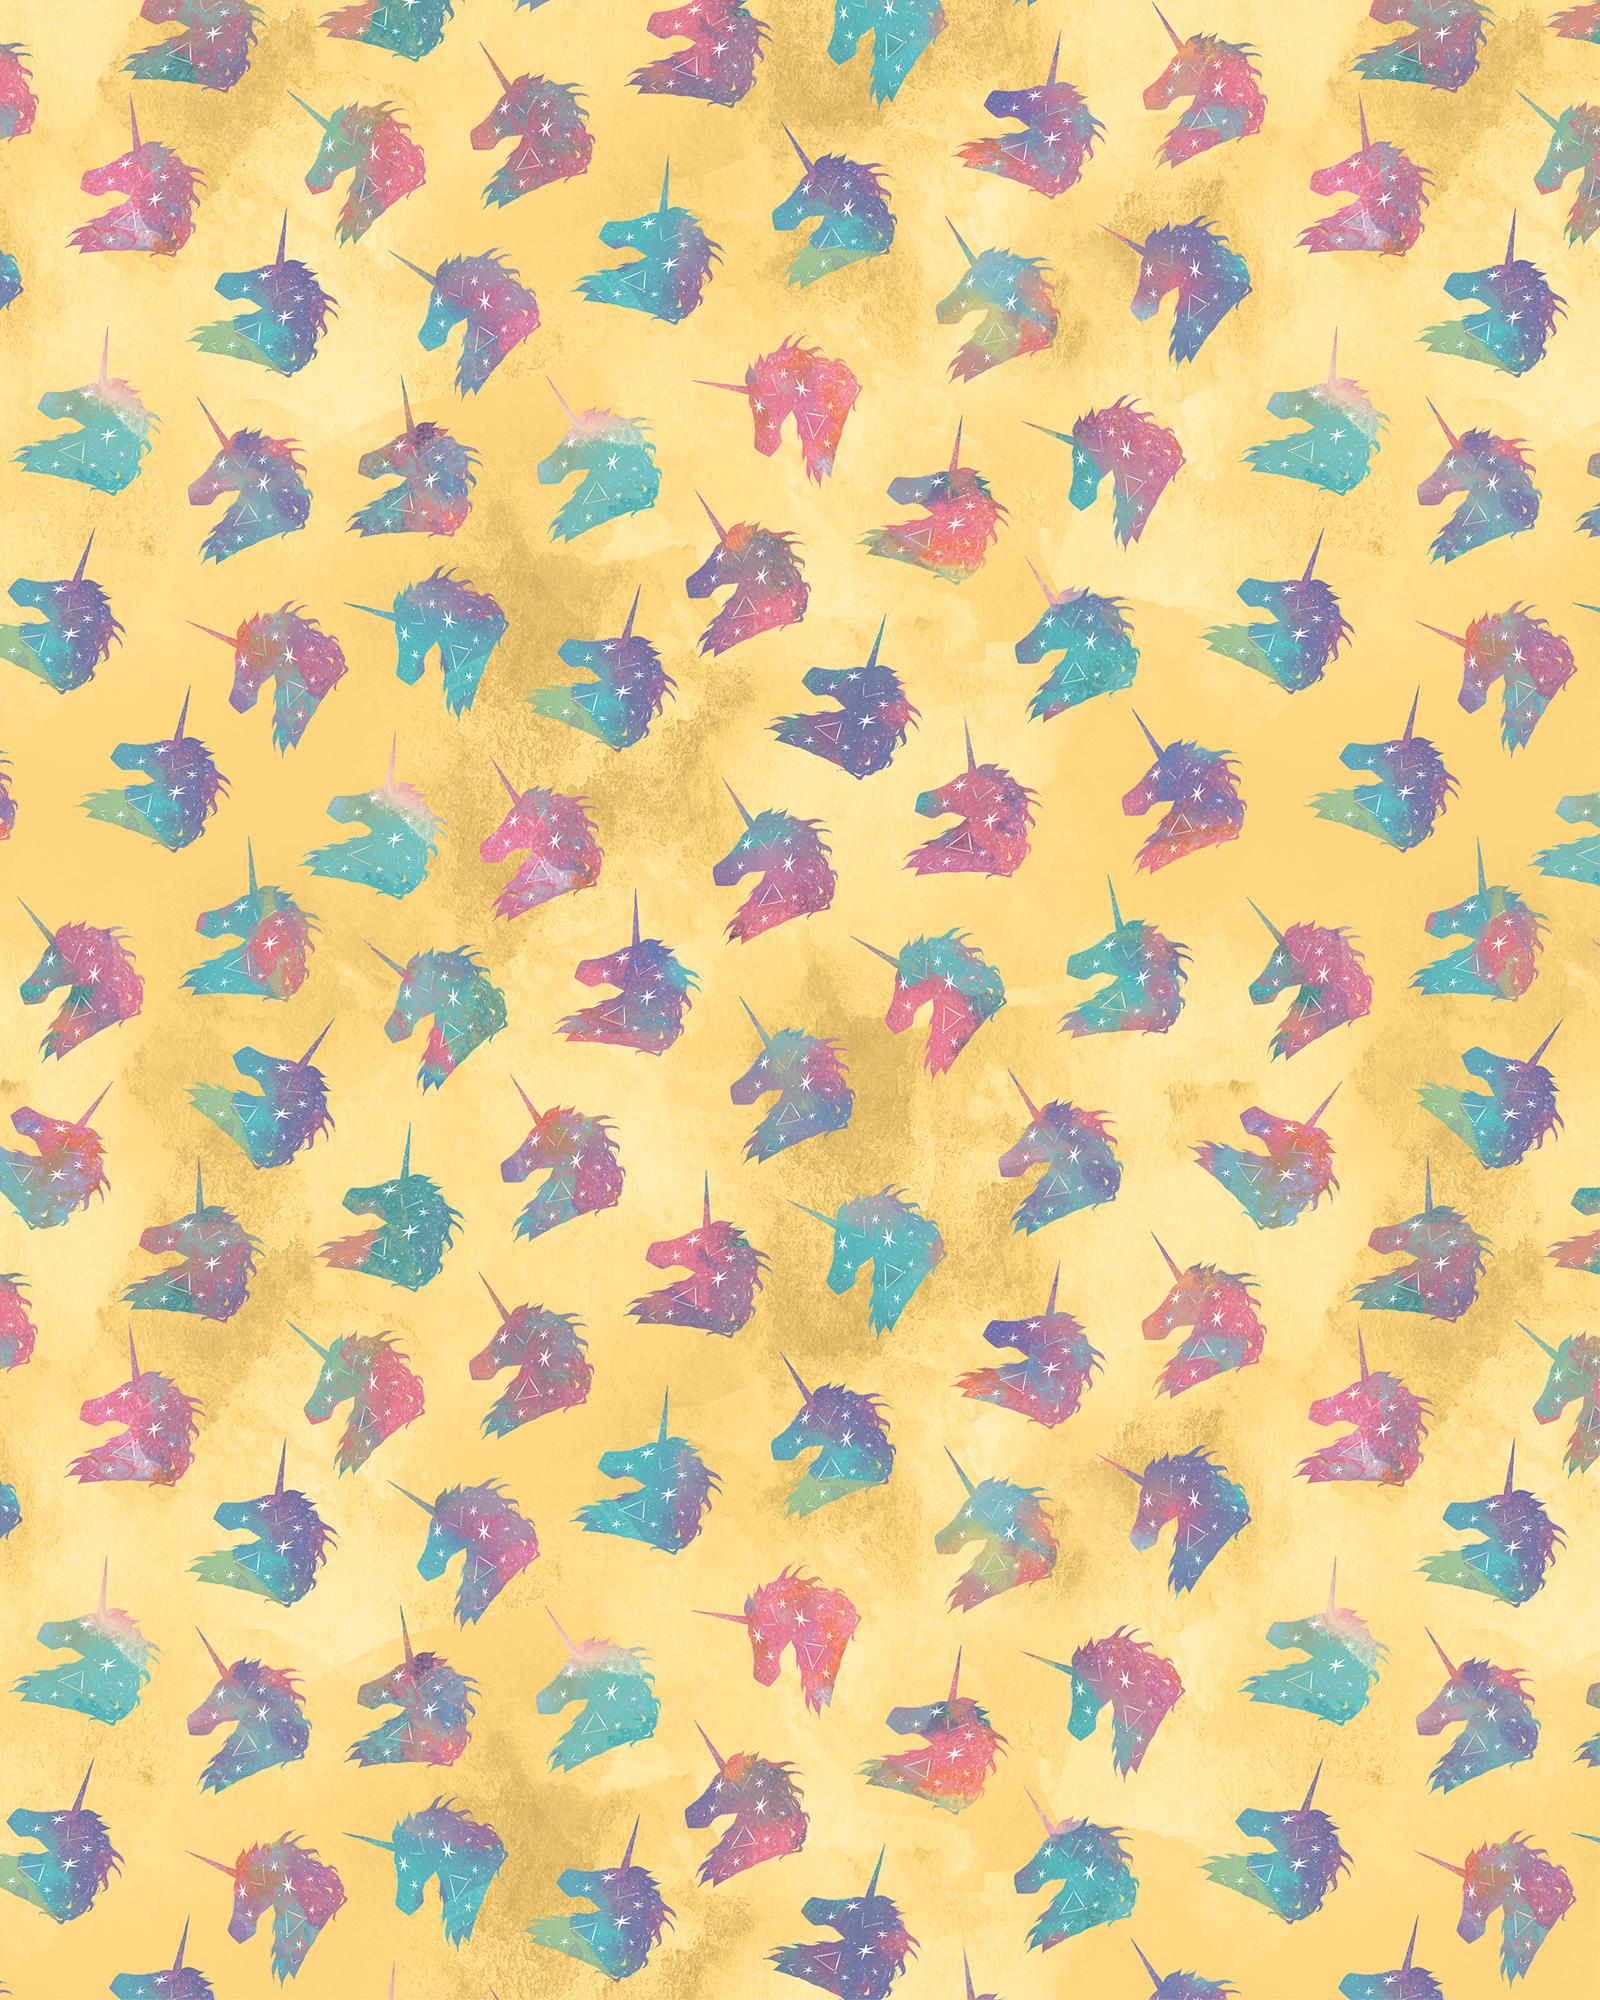 Rainbow Watercolor Unicorns